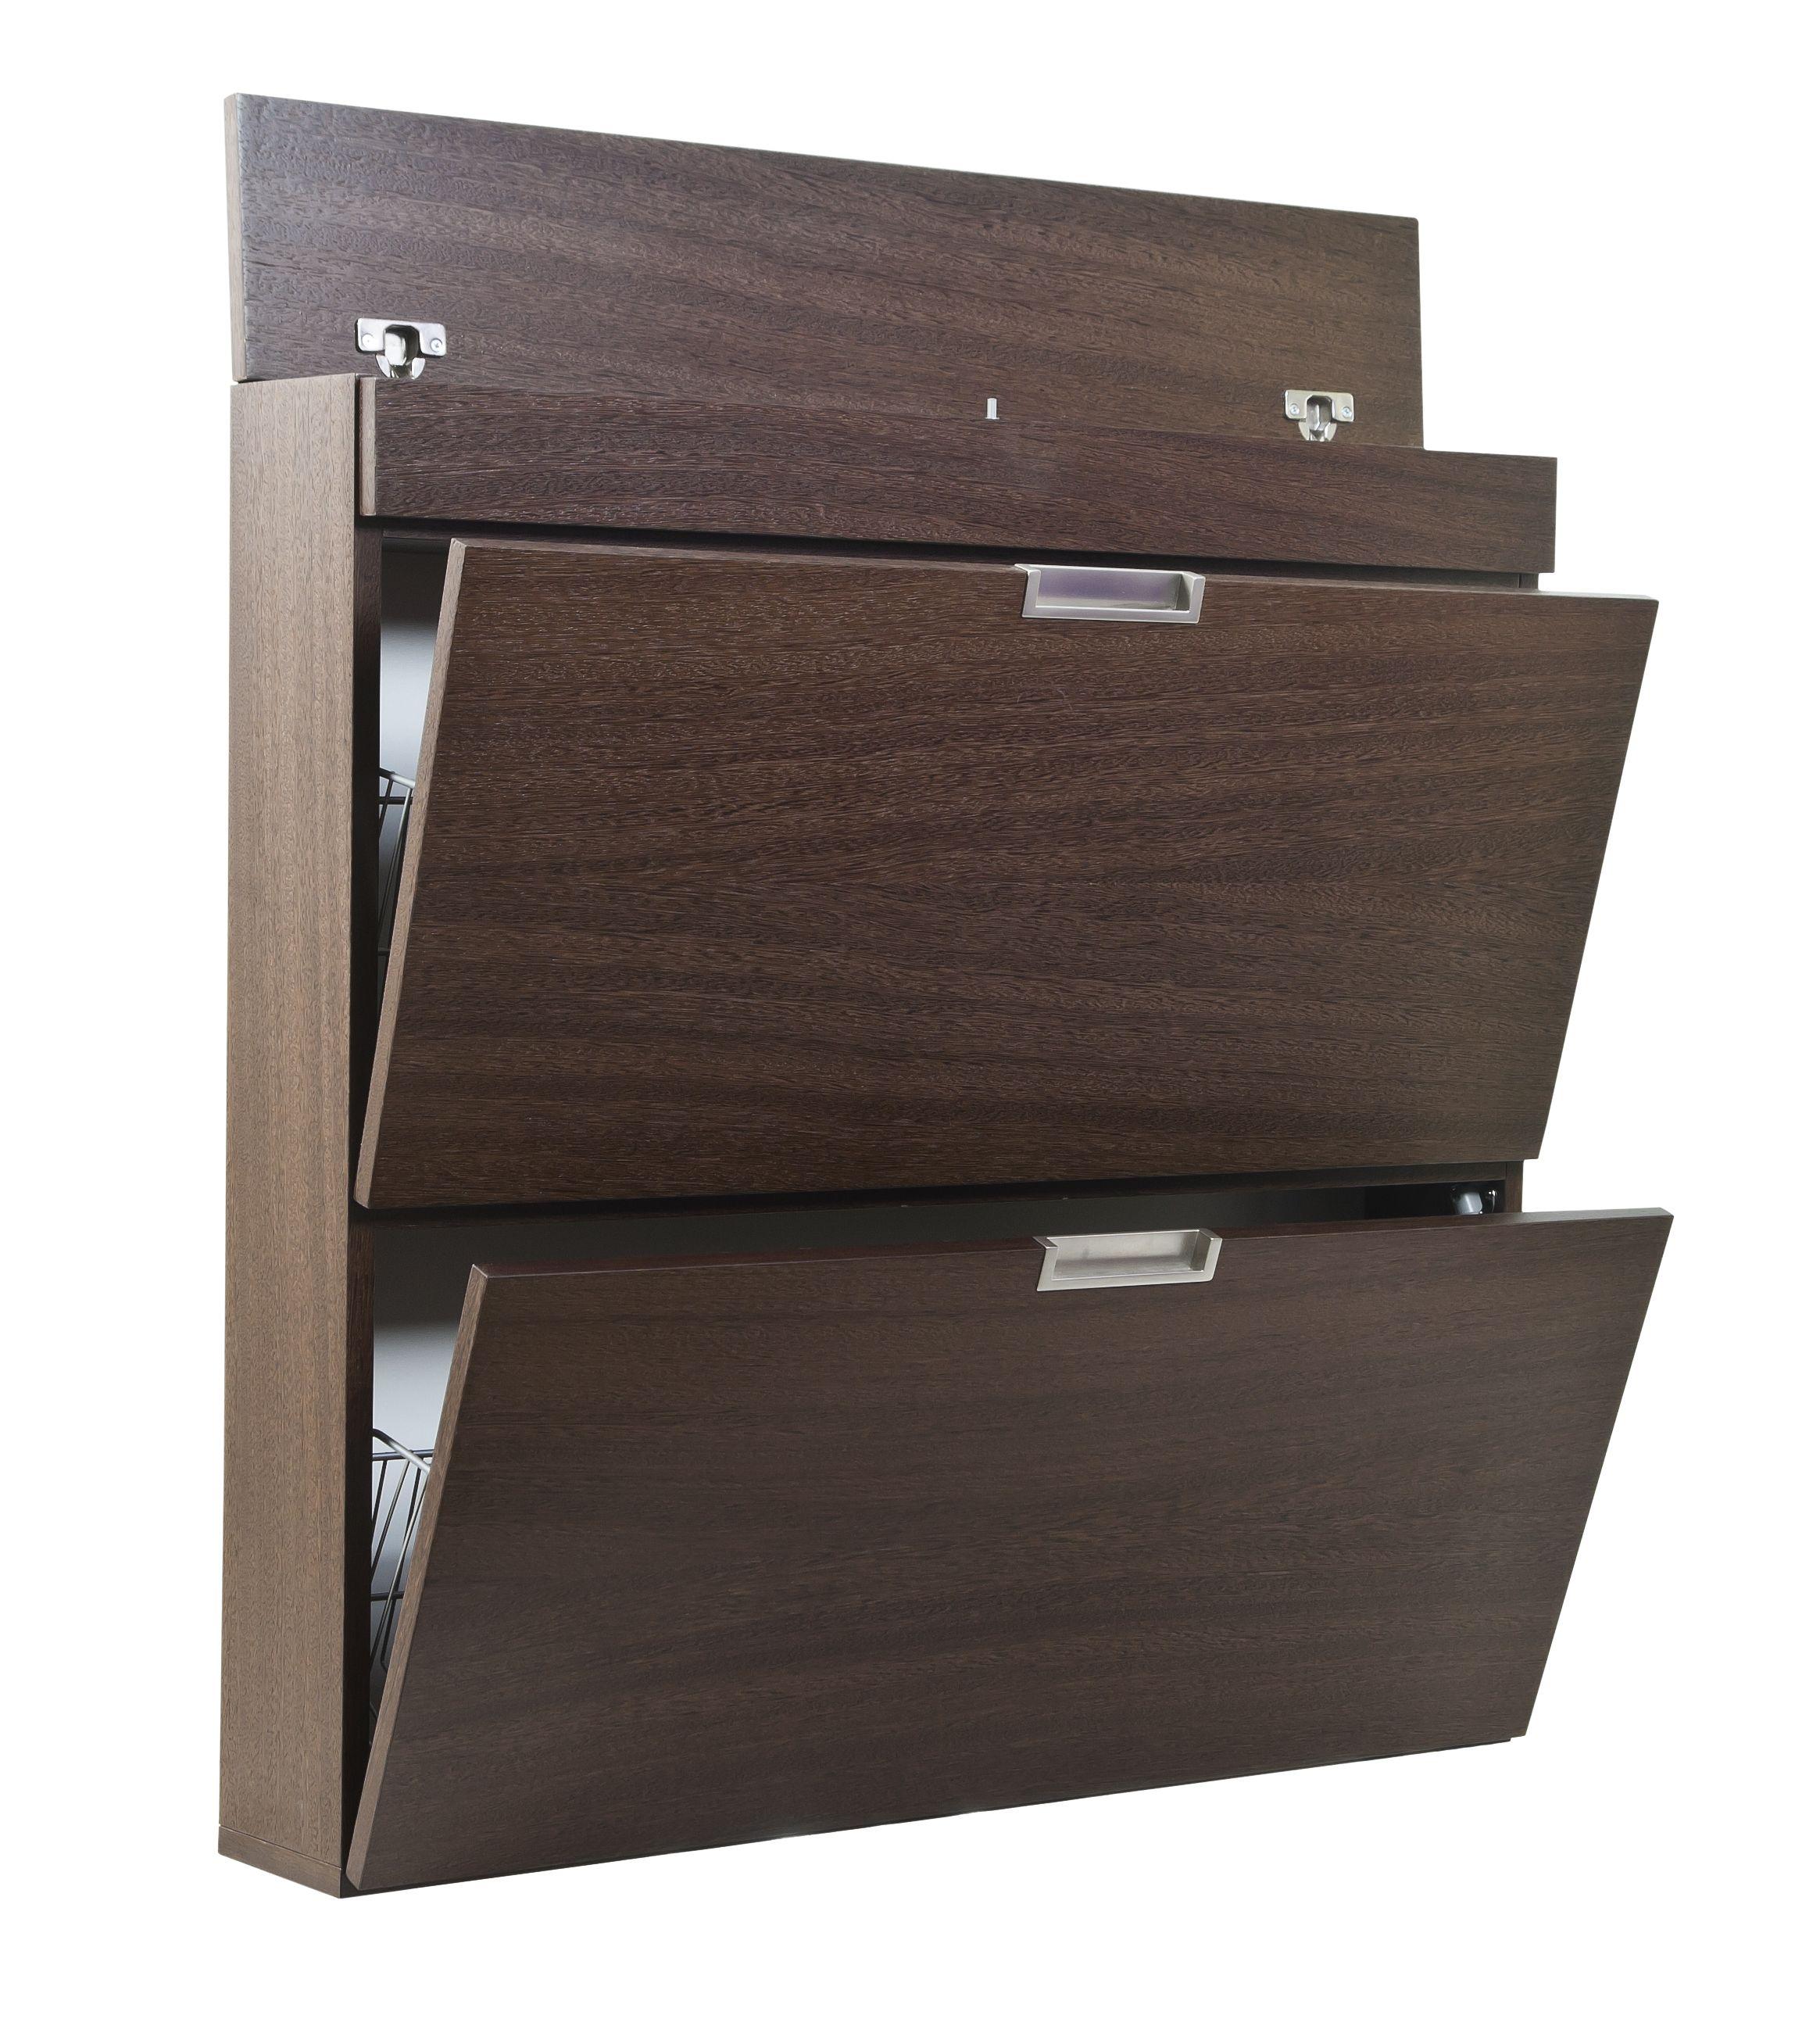 Szafka Na Buty Fornirowana Home Decor Furniture Storage